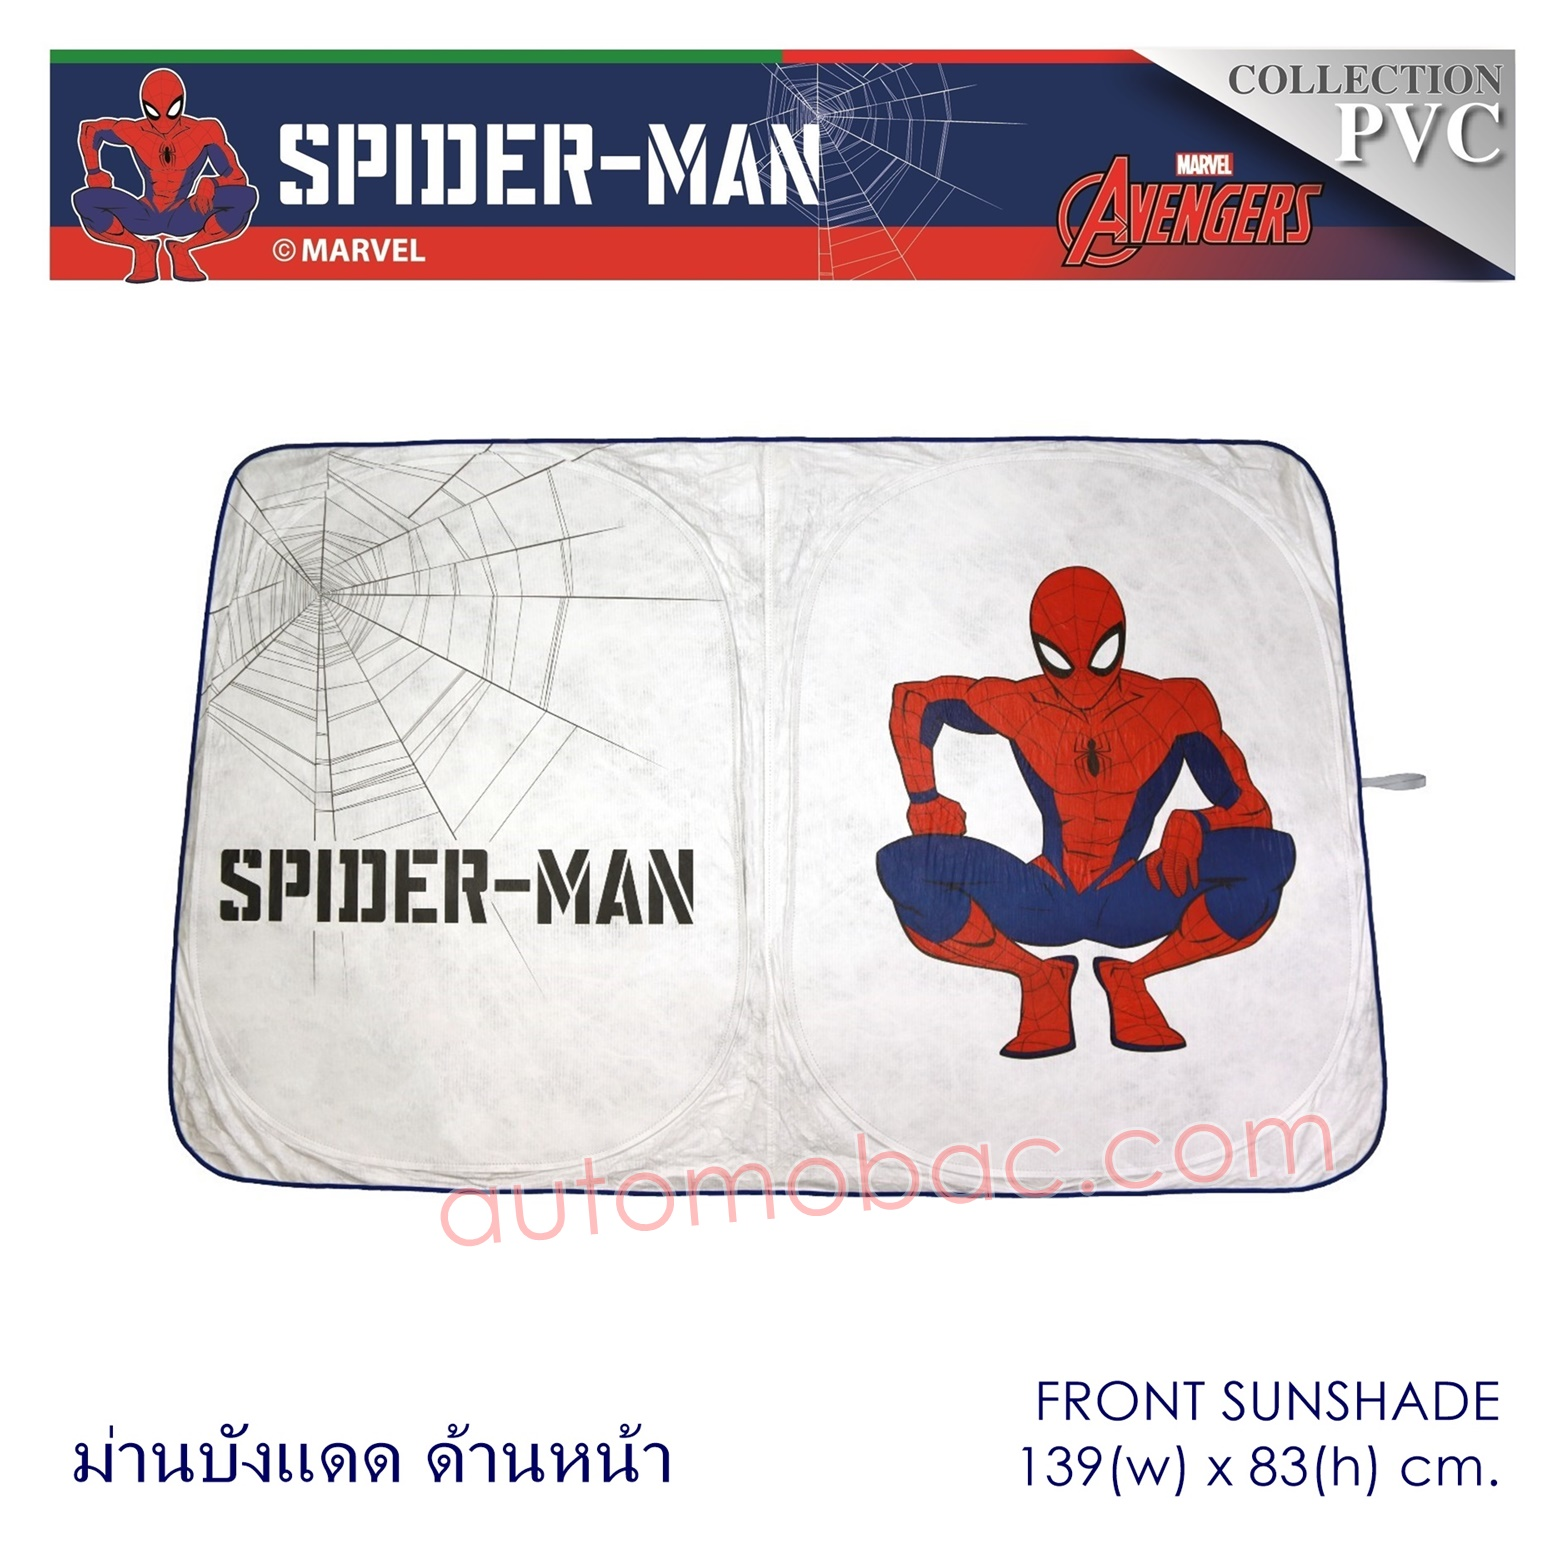 Spider-man ม่านบังแดดด้านหน้า ใช้บังแดดเพื่อปกป้อง UV และความร้อนที่ผ่านเข้ามา ขนาด 83x139 cm.